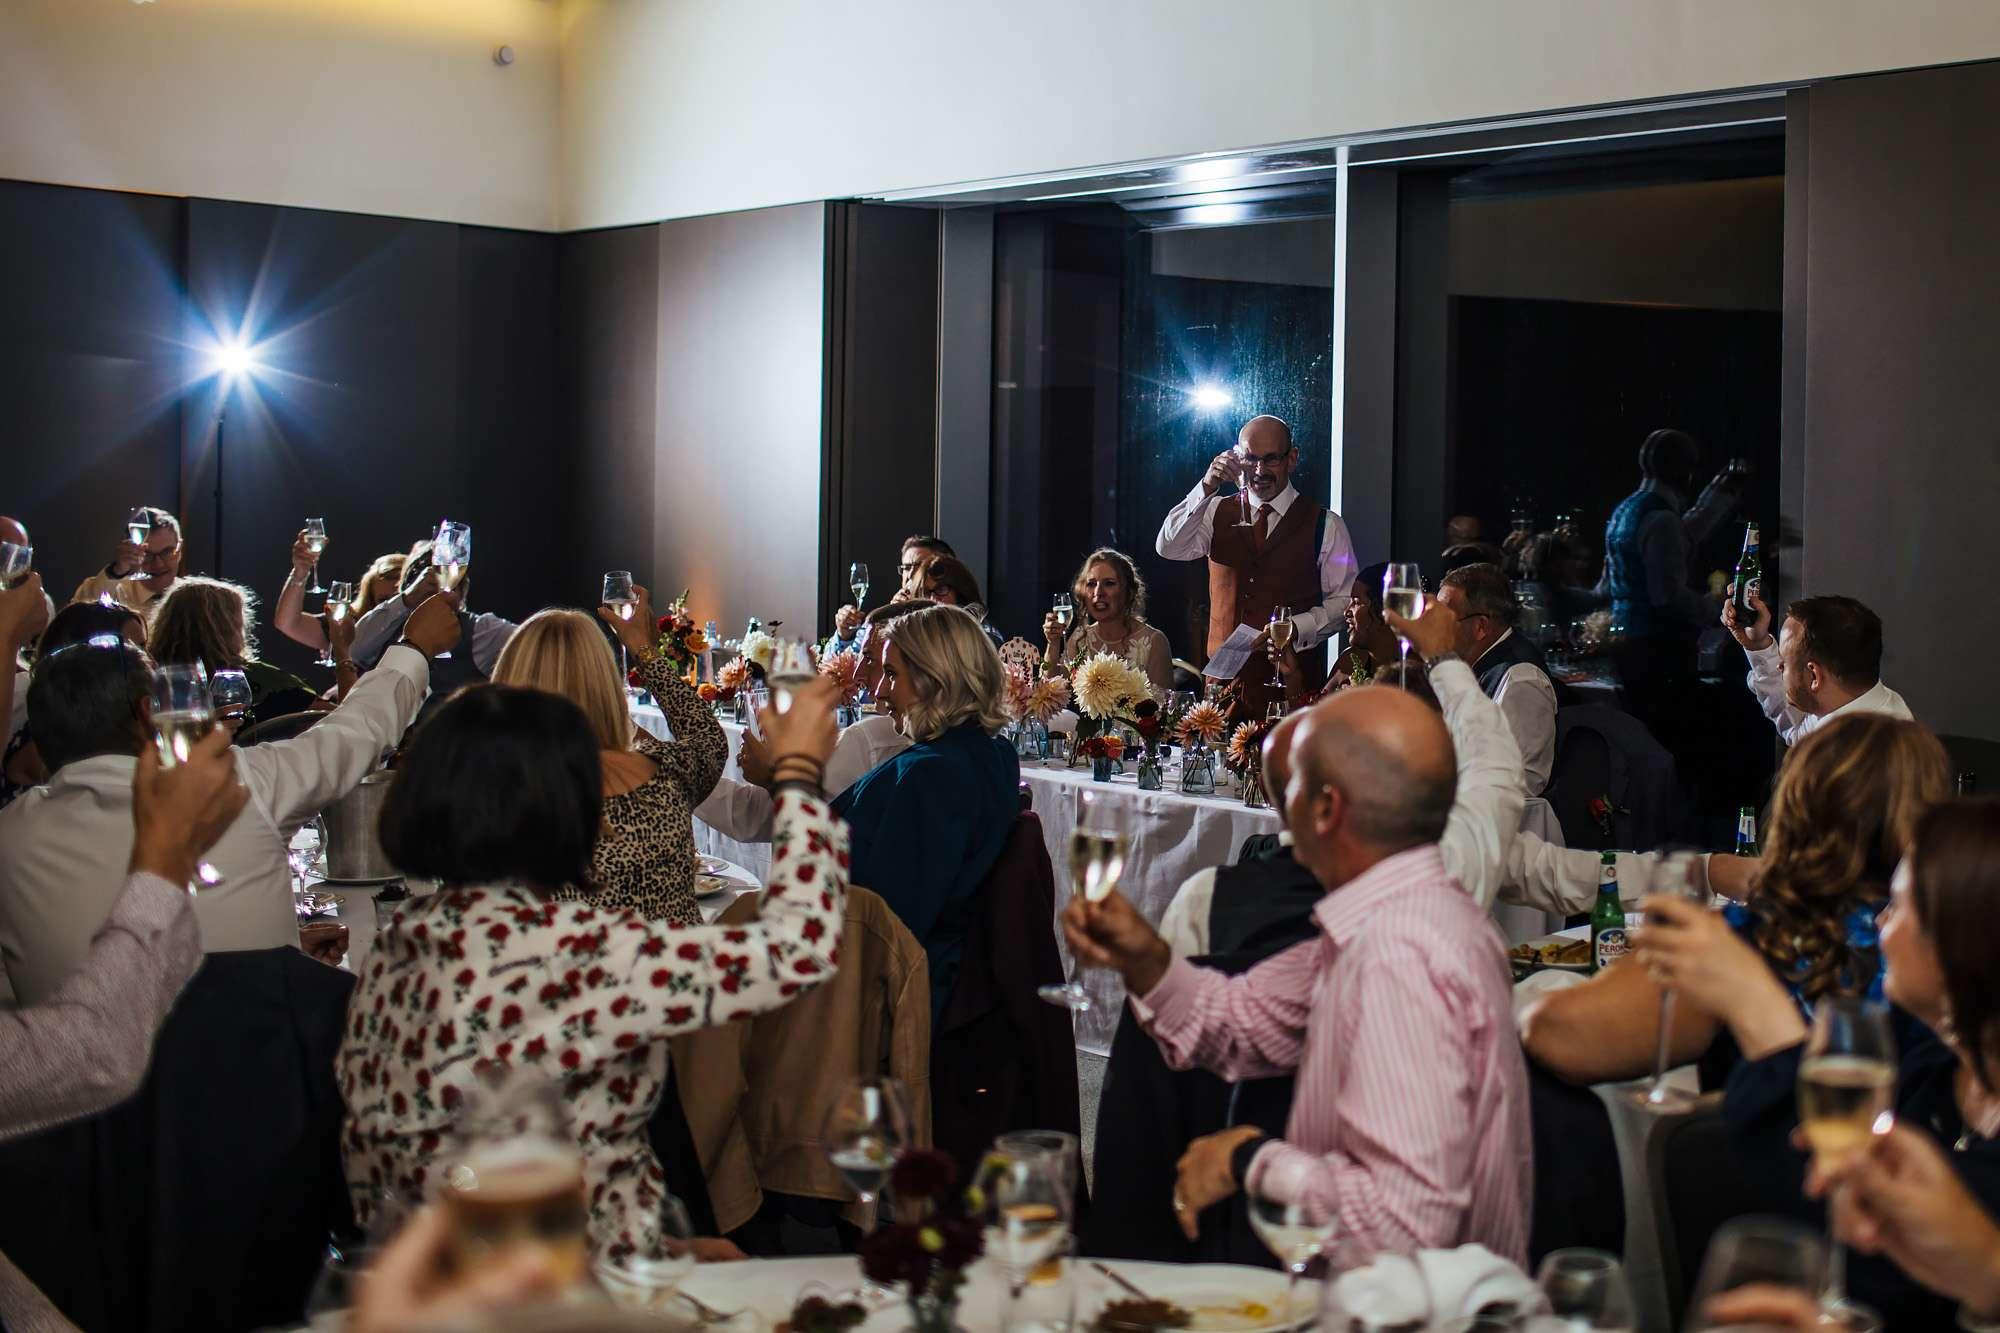 Wedding speeches at Hepworth Art Gallery